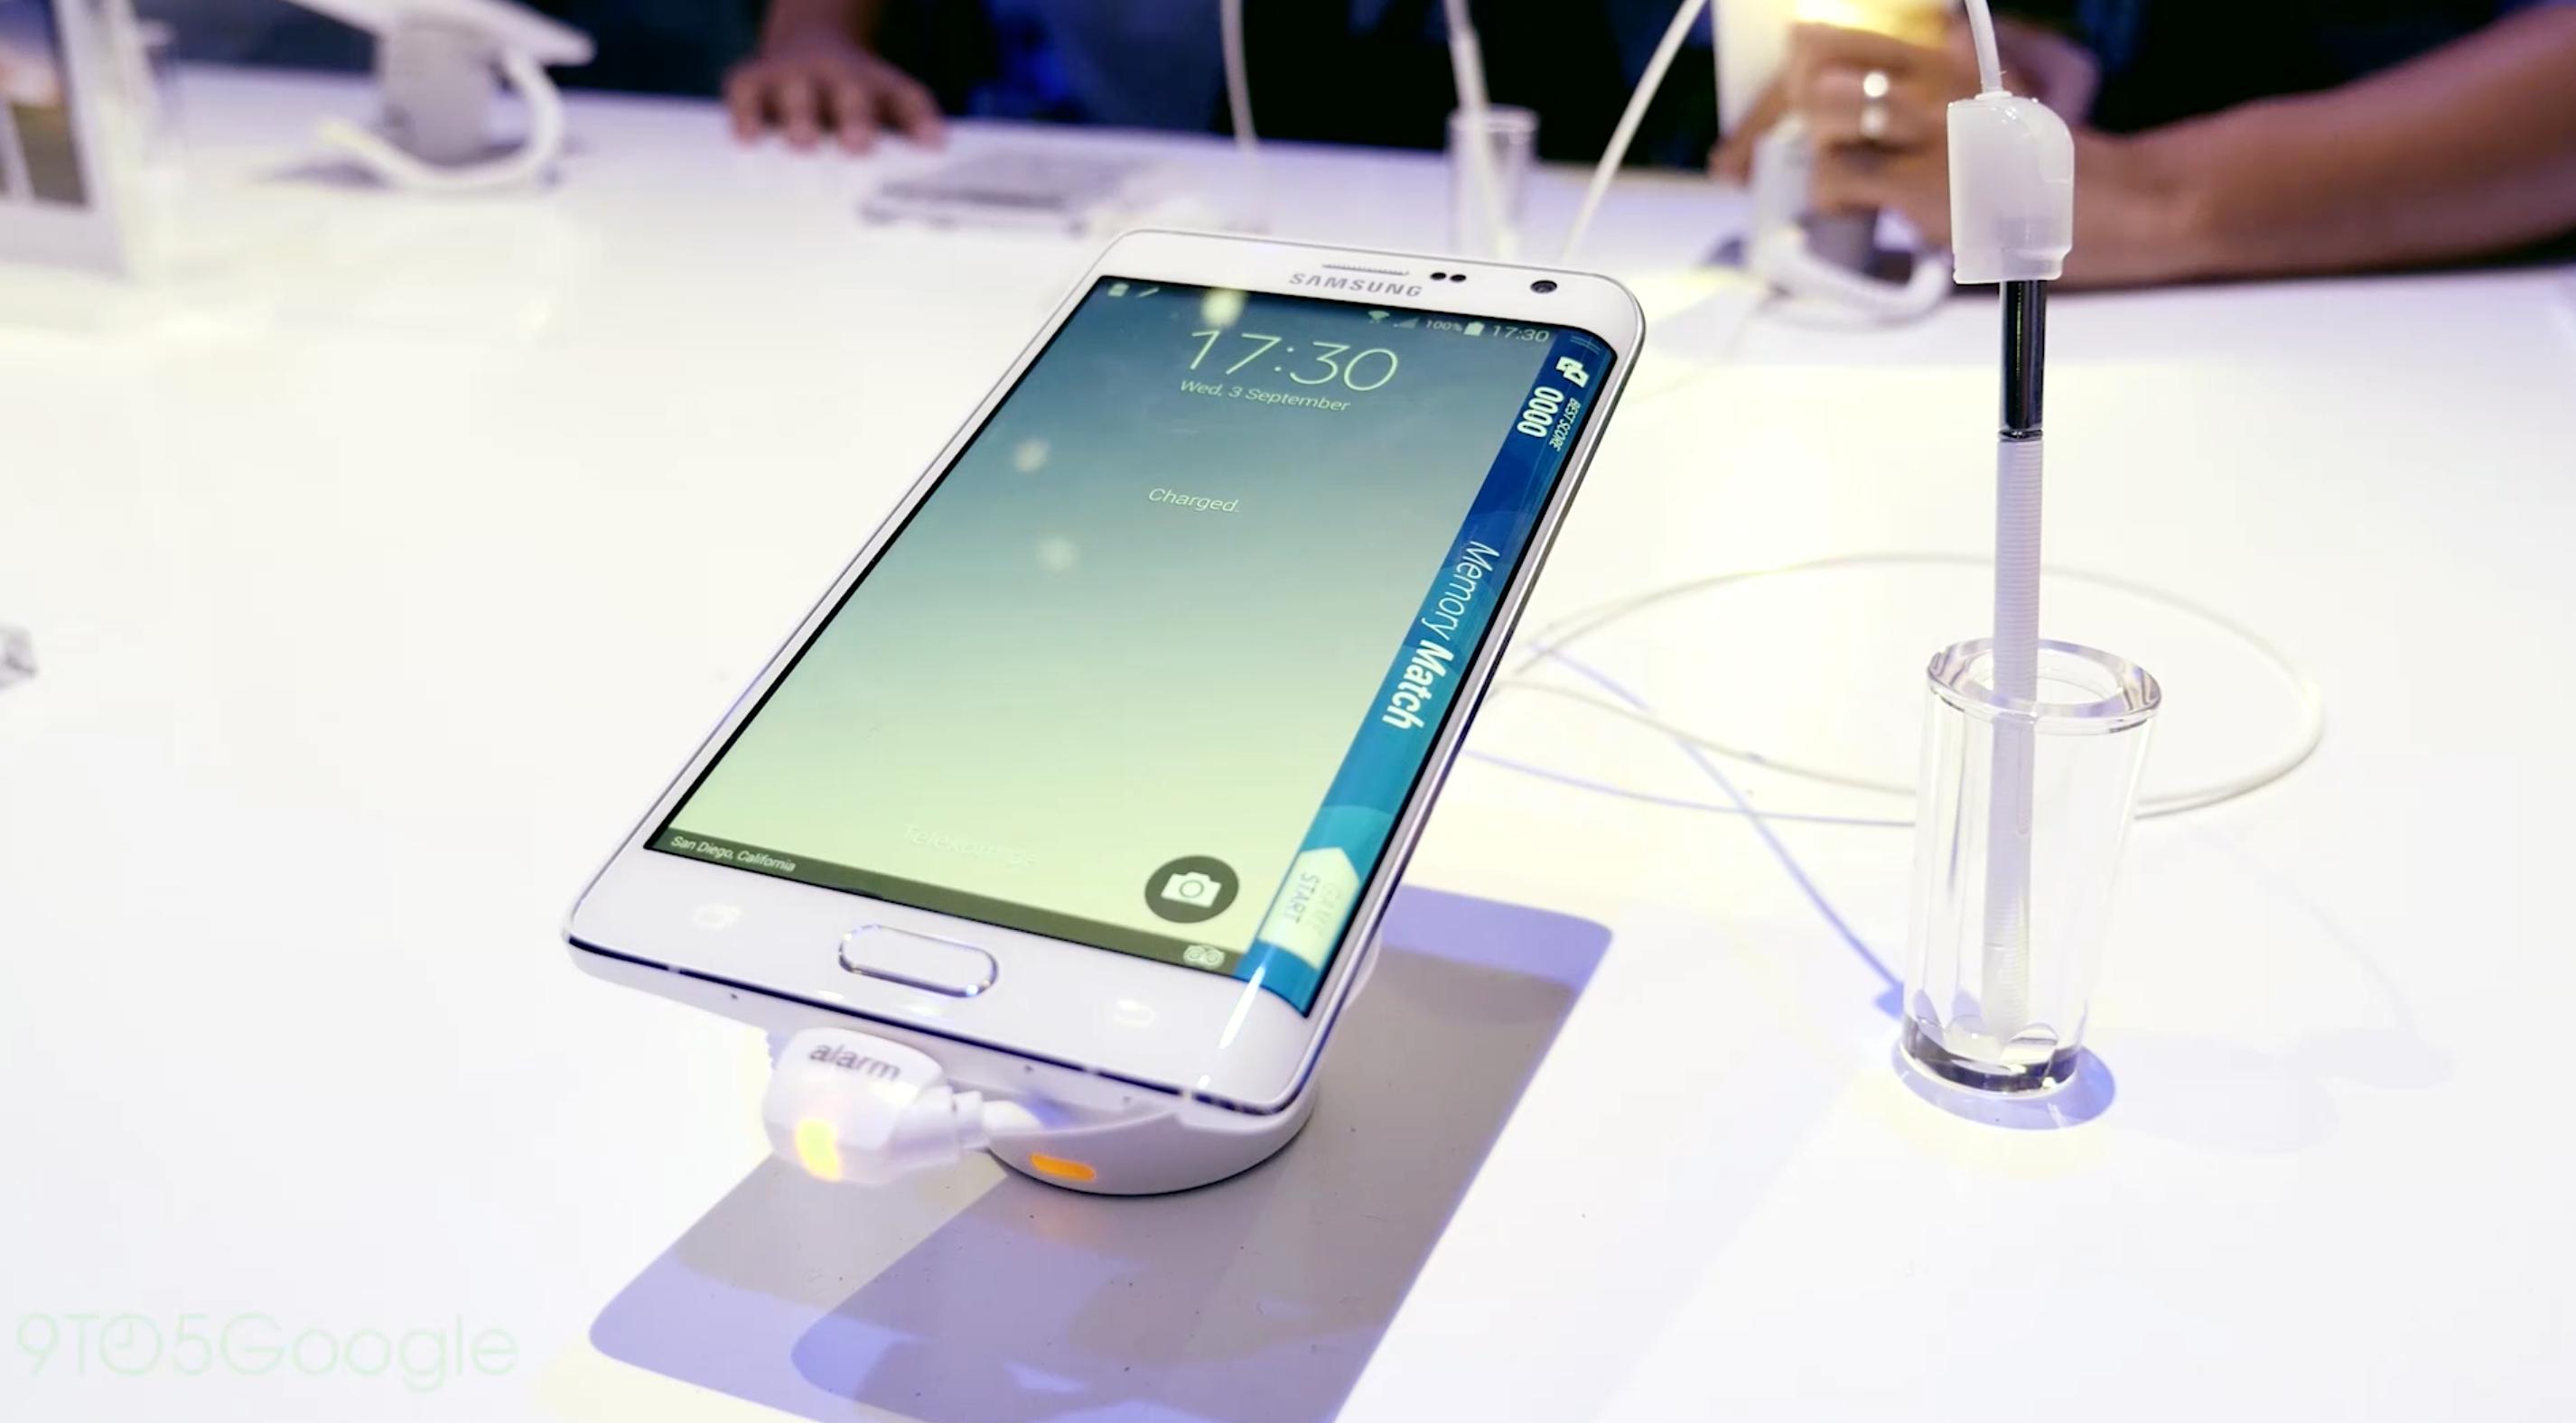 Samsung Galaxy Note Edge: Unique Android Smartphone